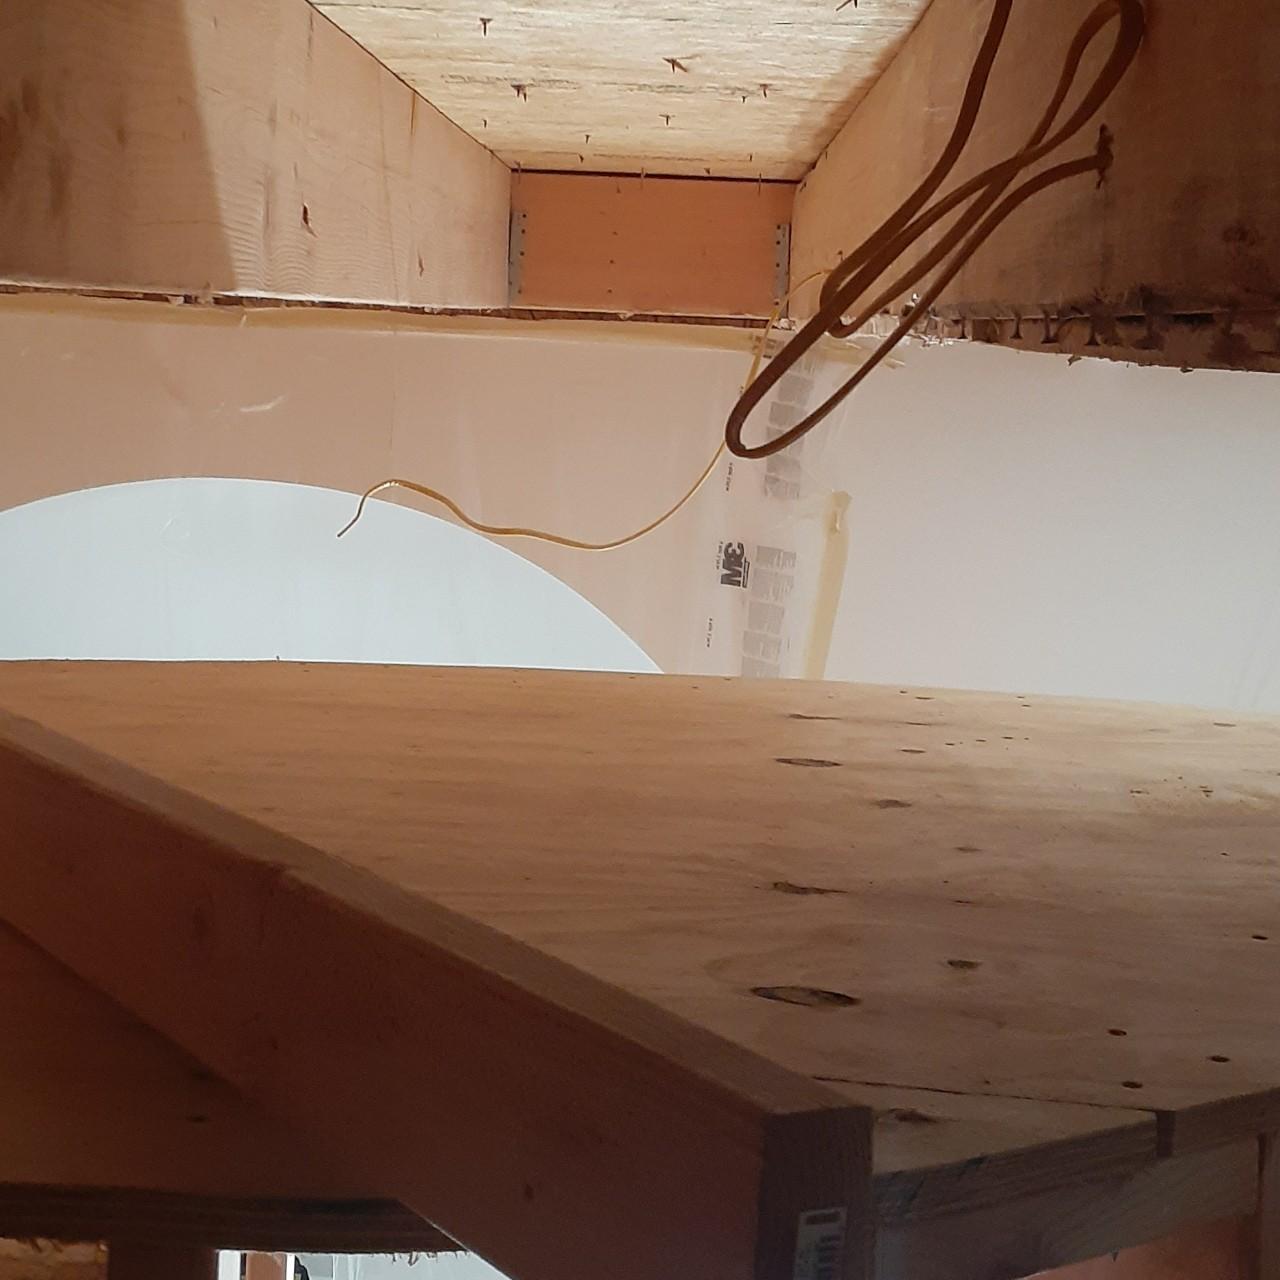 carpentry-wood-framing-second-floor-home-addition--framing-43